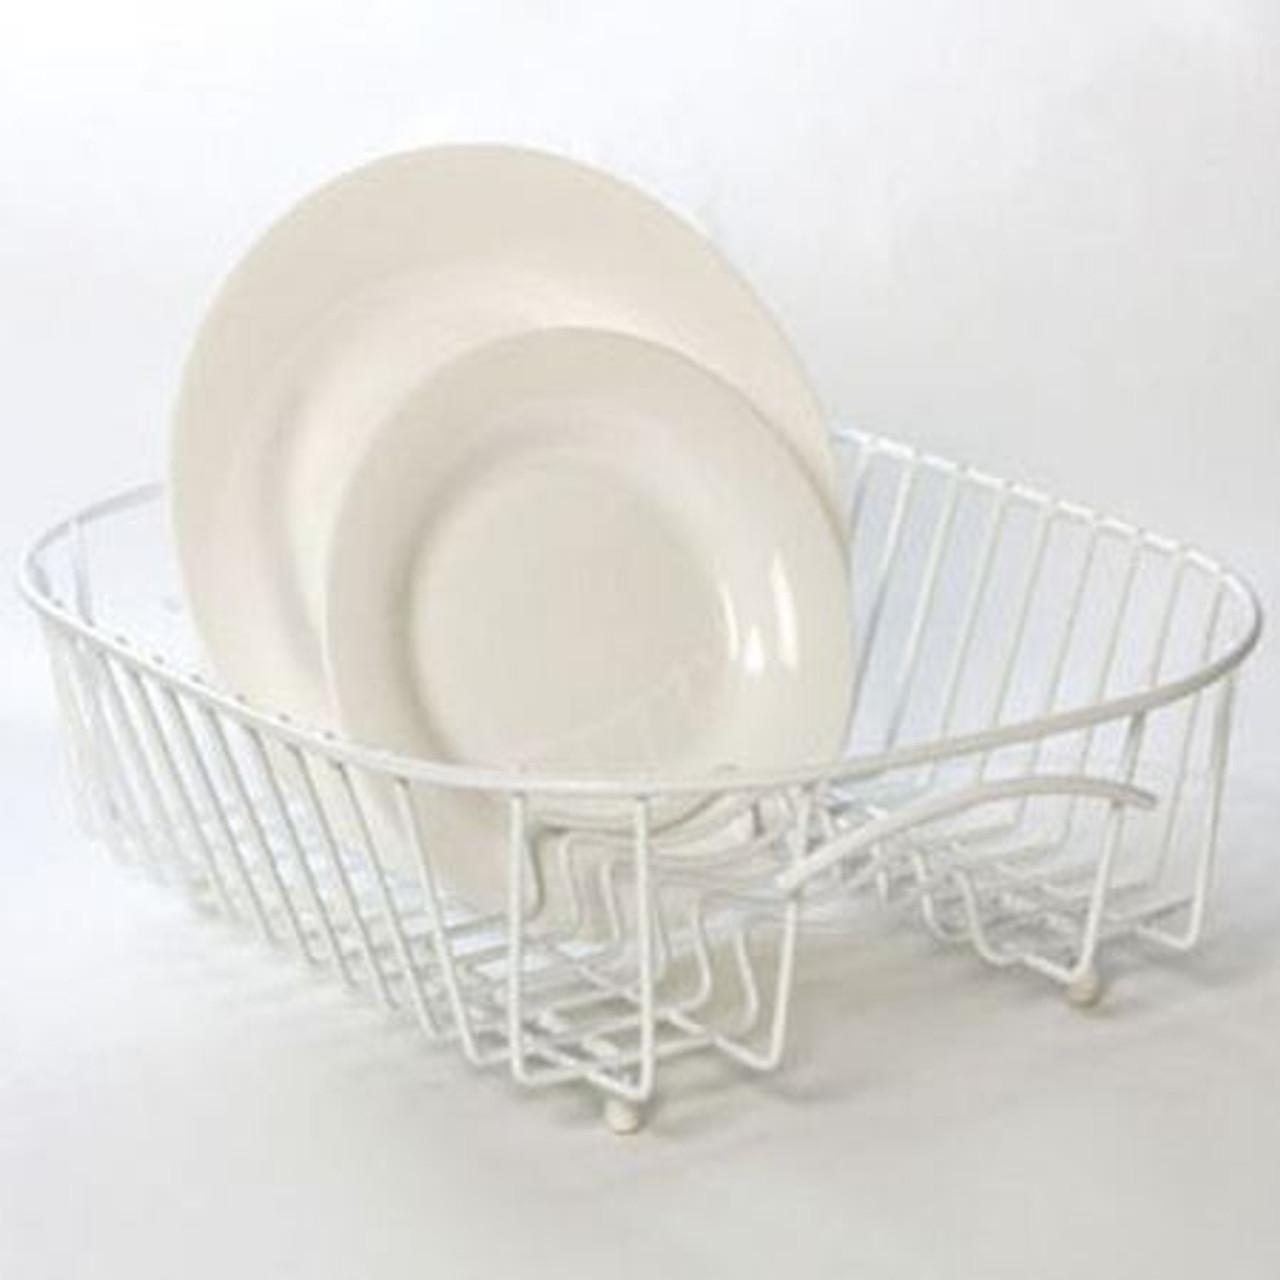 Delfinware Plate Sink Basket in White